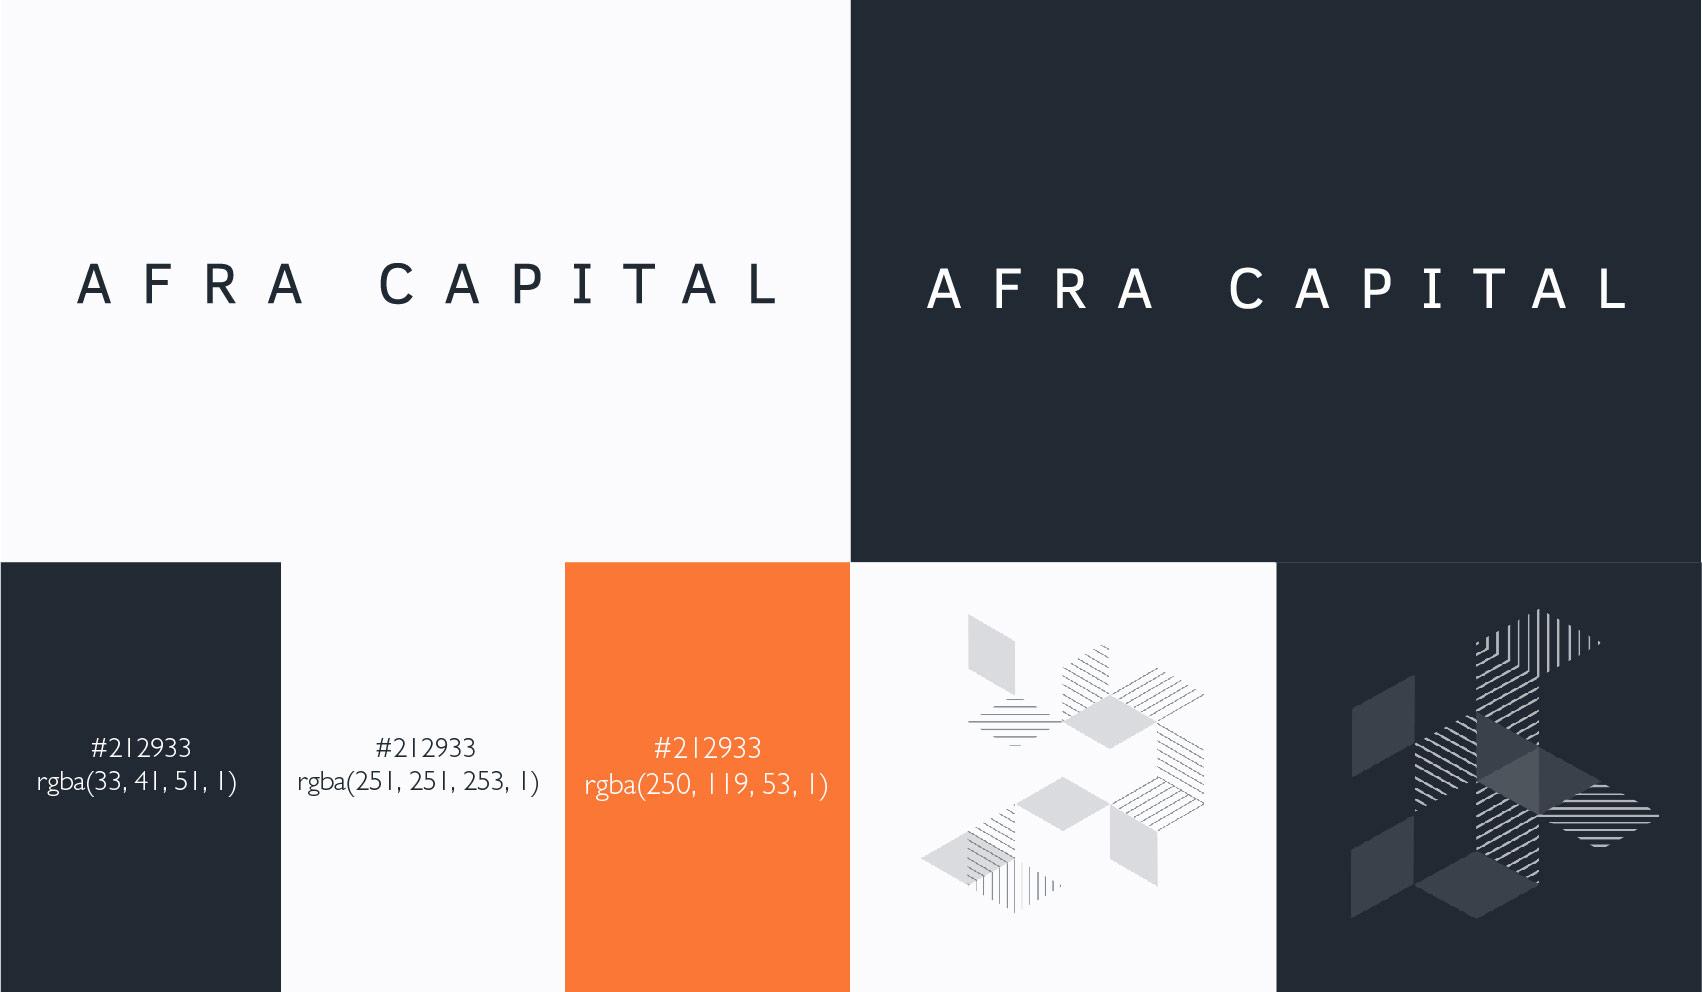 Afra Capital Brand Guidelines